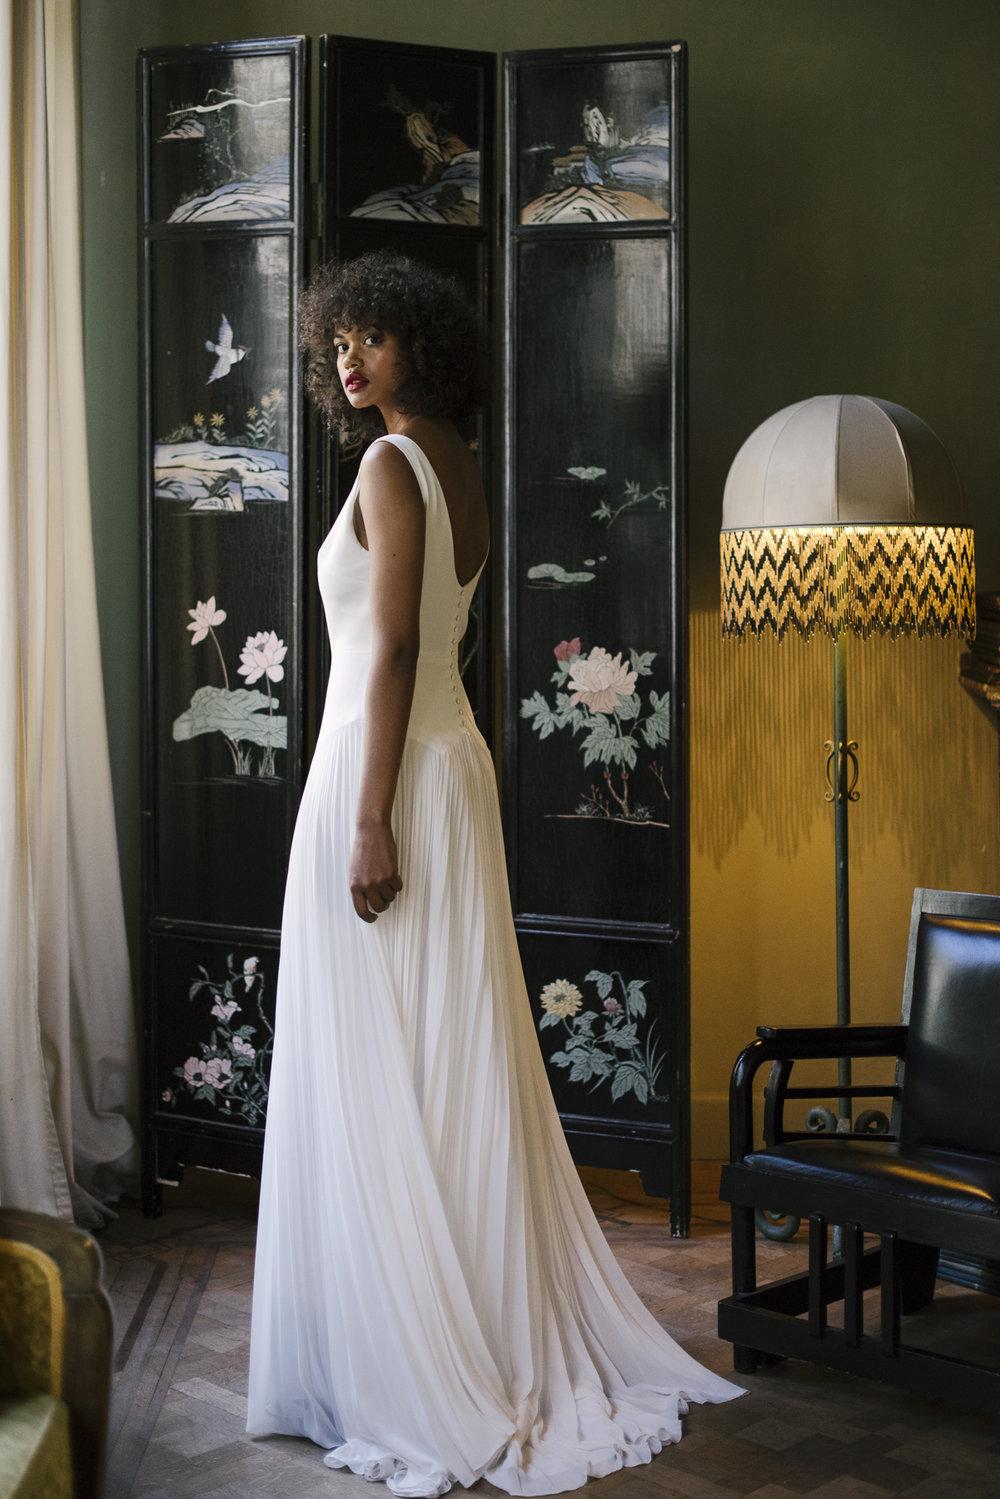 valentine-avoh-robe-mariee-grace-wedding-dress-bruxelles-photo-elodie-timmermans-5.jpg